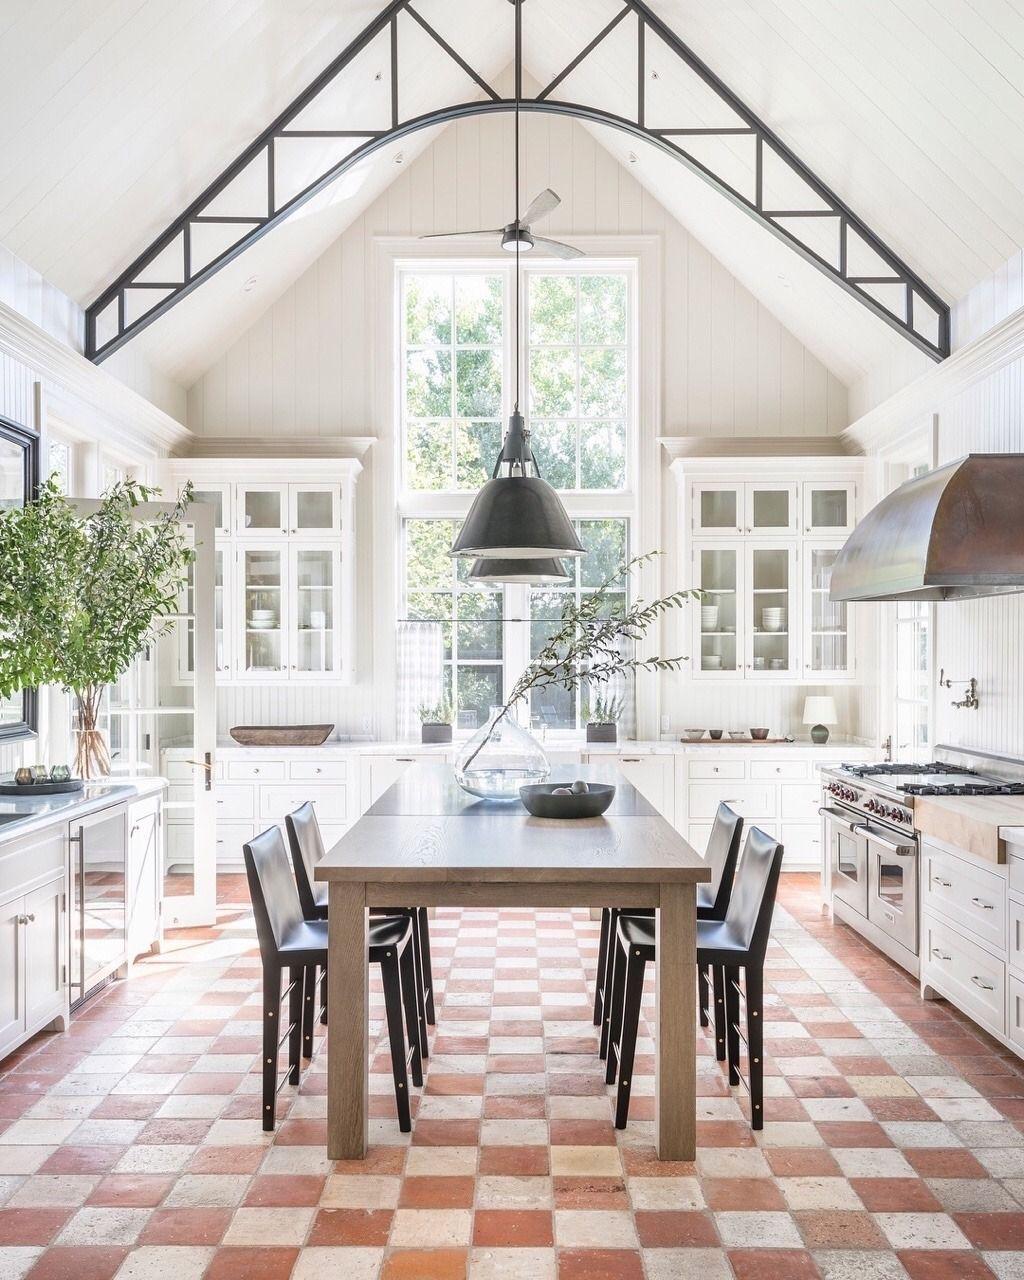 Interior Inspiration How To Plan The Perfect Kitchen: VICTORIA HAGAN INTERIORSPursue Your